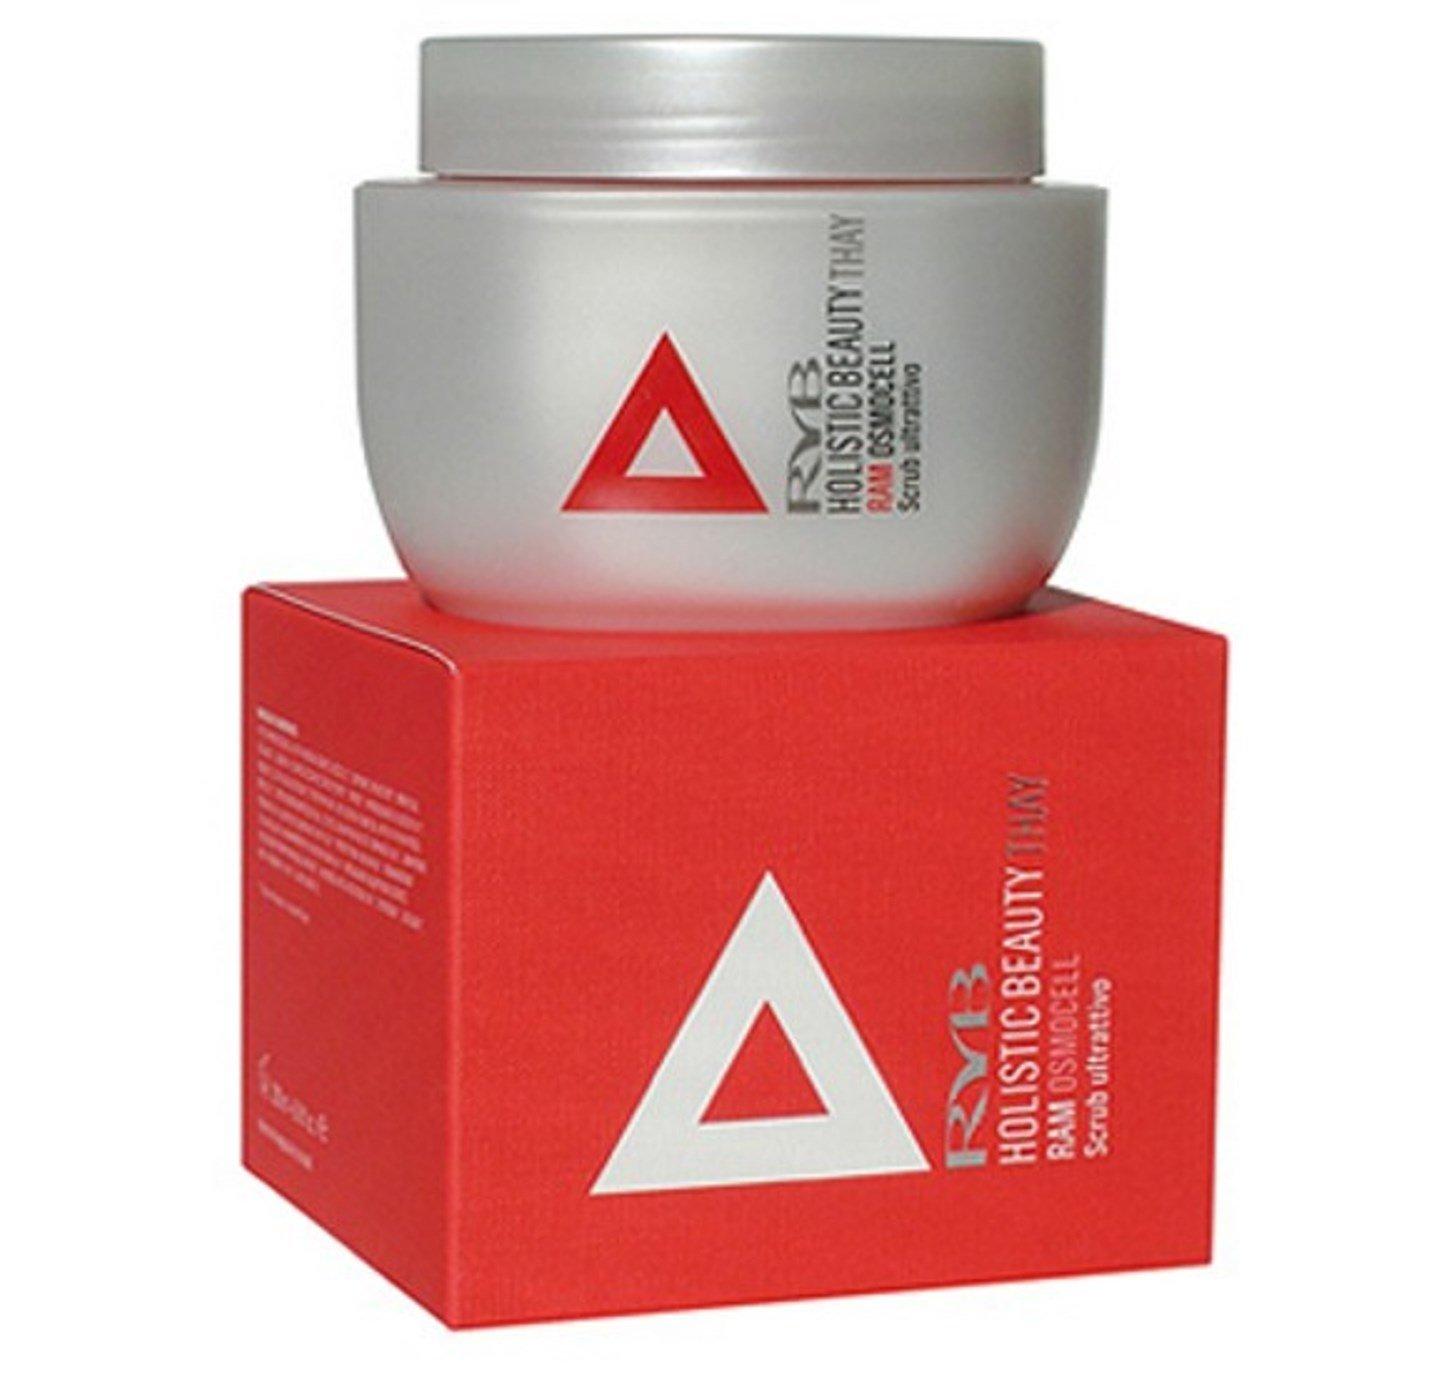 RVB Holistic Beauty Thay RAM Osmocell Ultra Massage Cream 200 ml